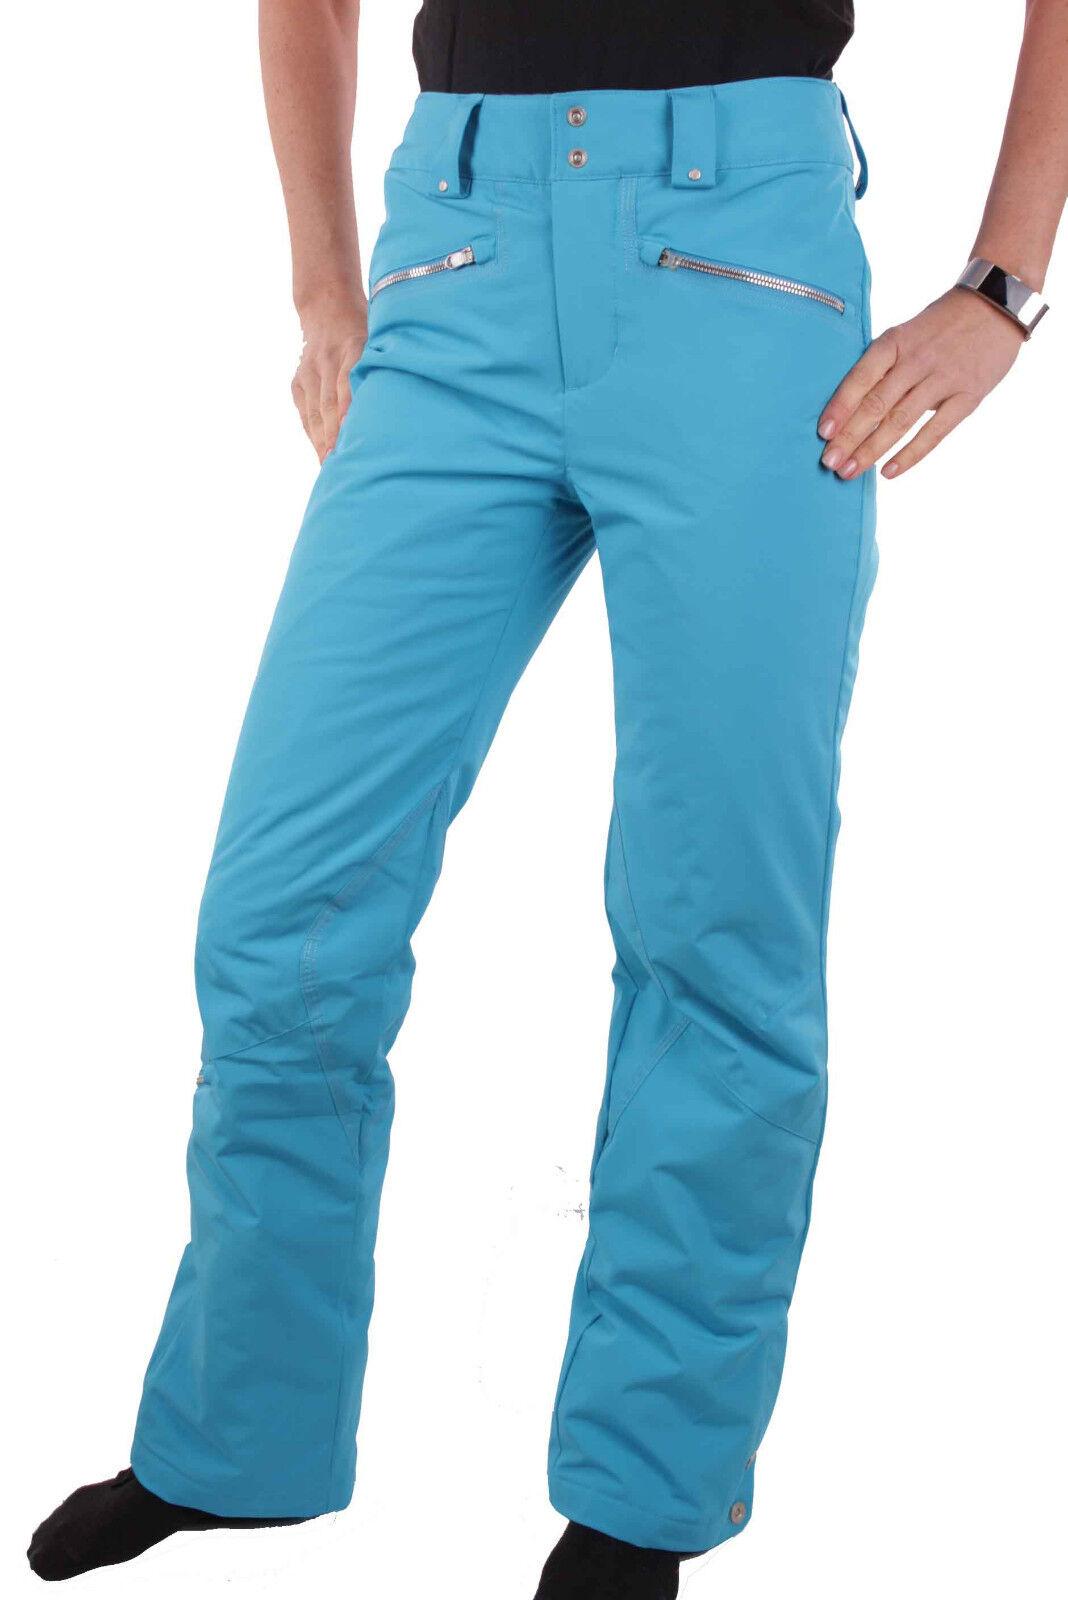 Spyder Damen 154503-425 Skihose ME TailGoldt Fit Pant Pant Pant Blau ec13a3